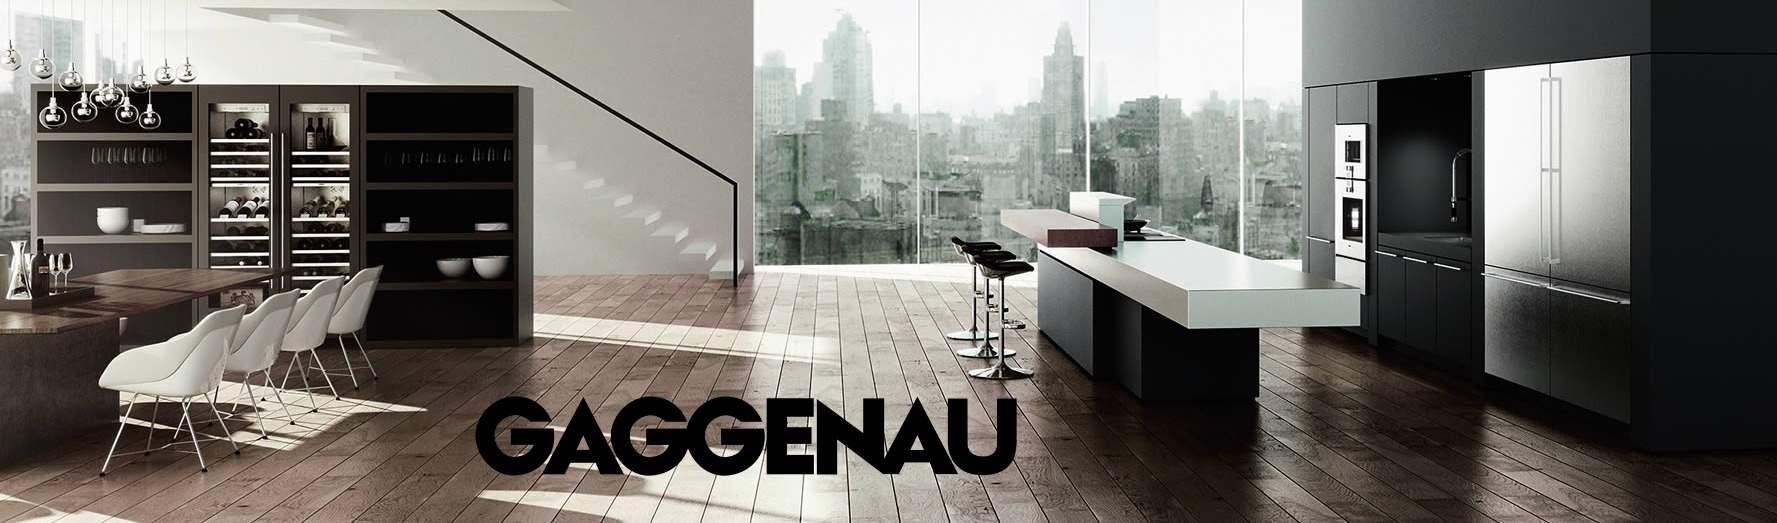 gaggenau showroom